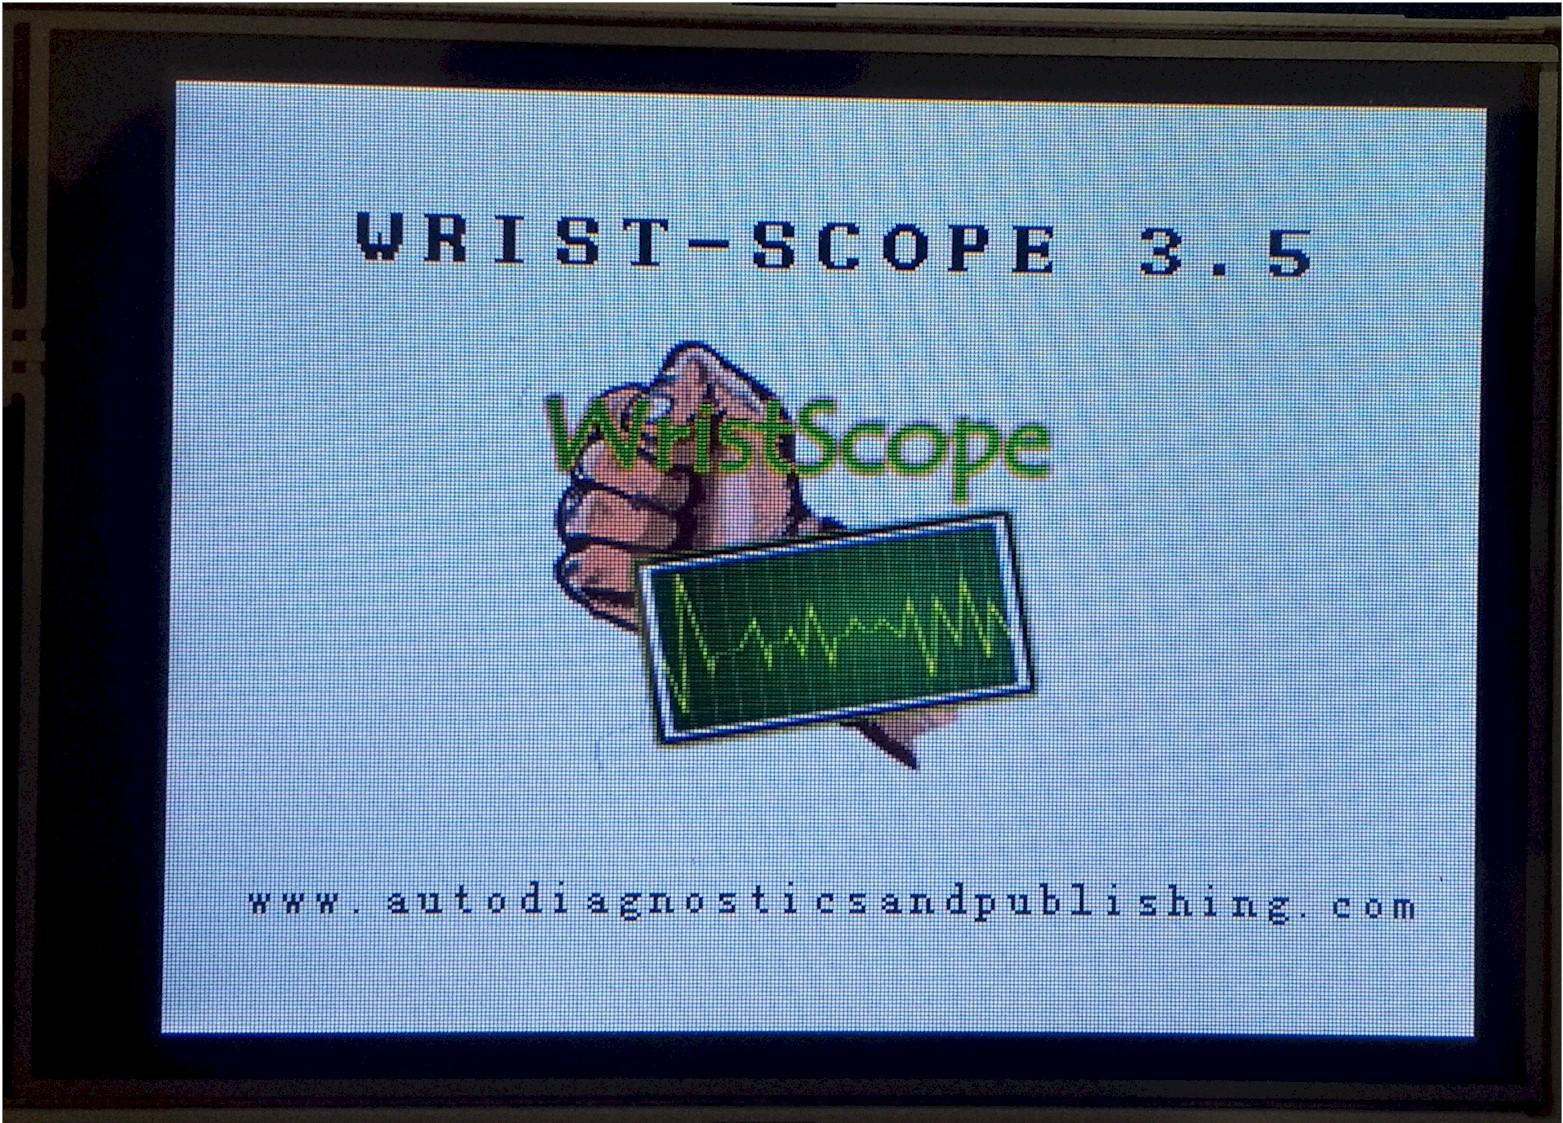 WristScope intry screen